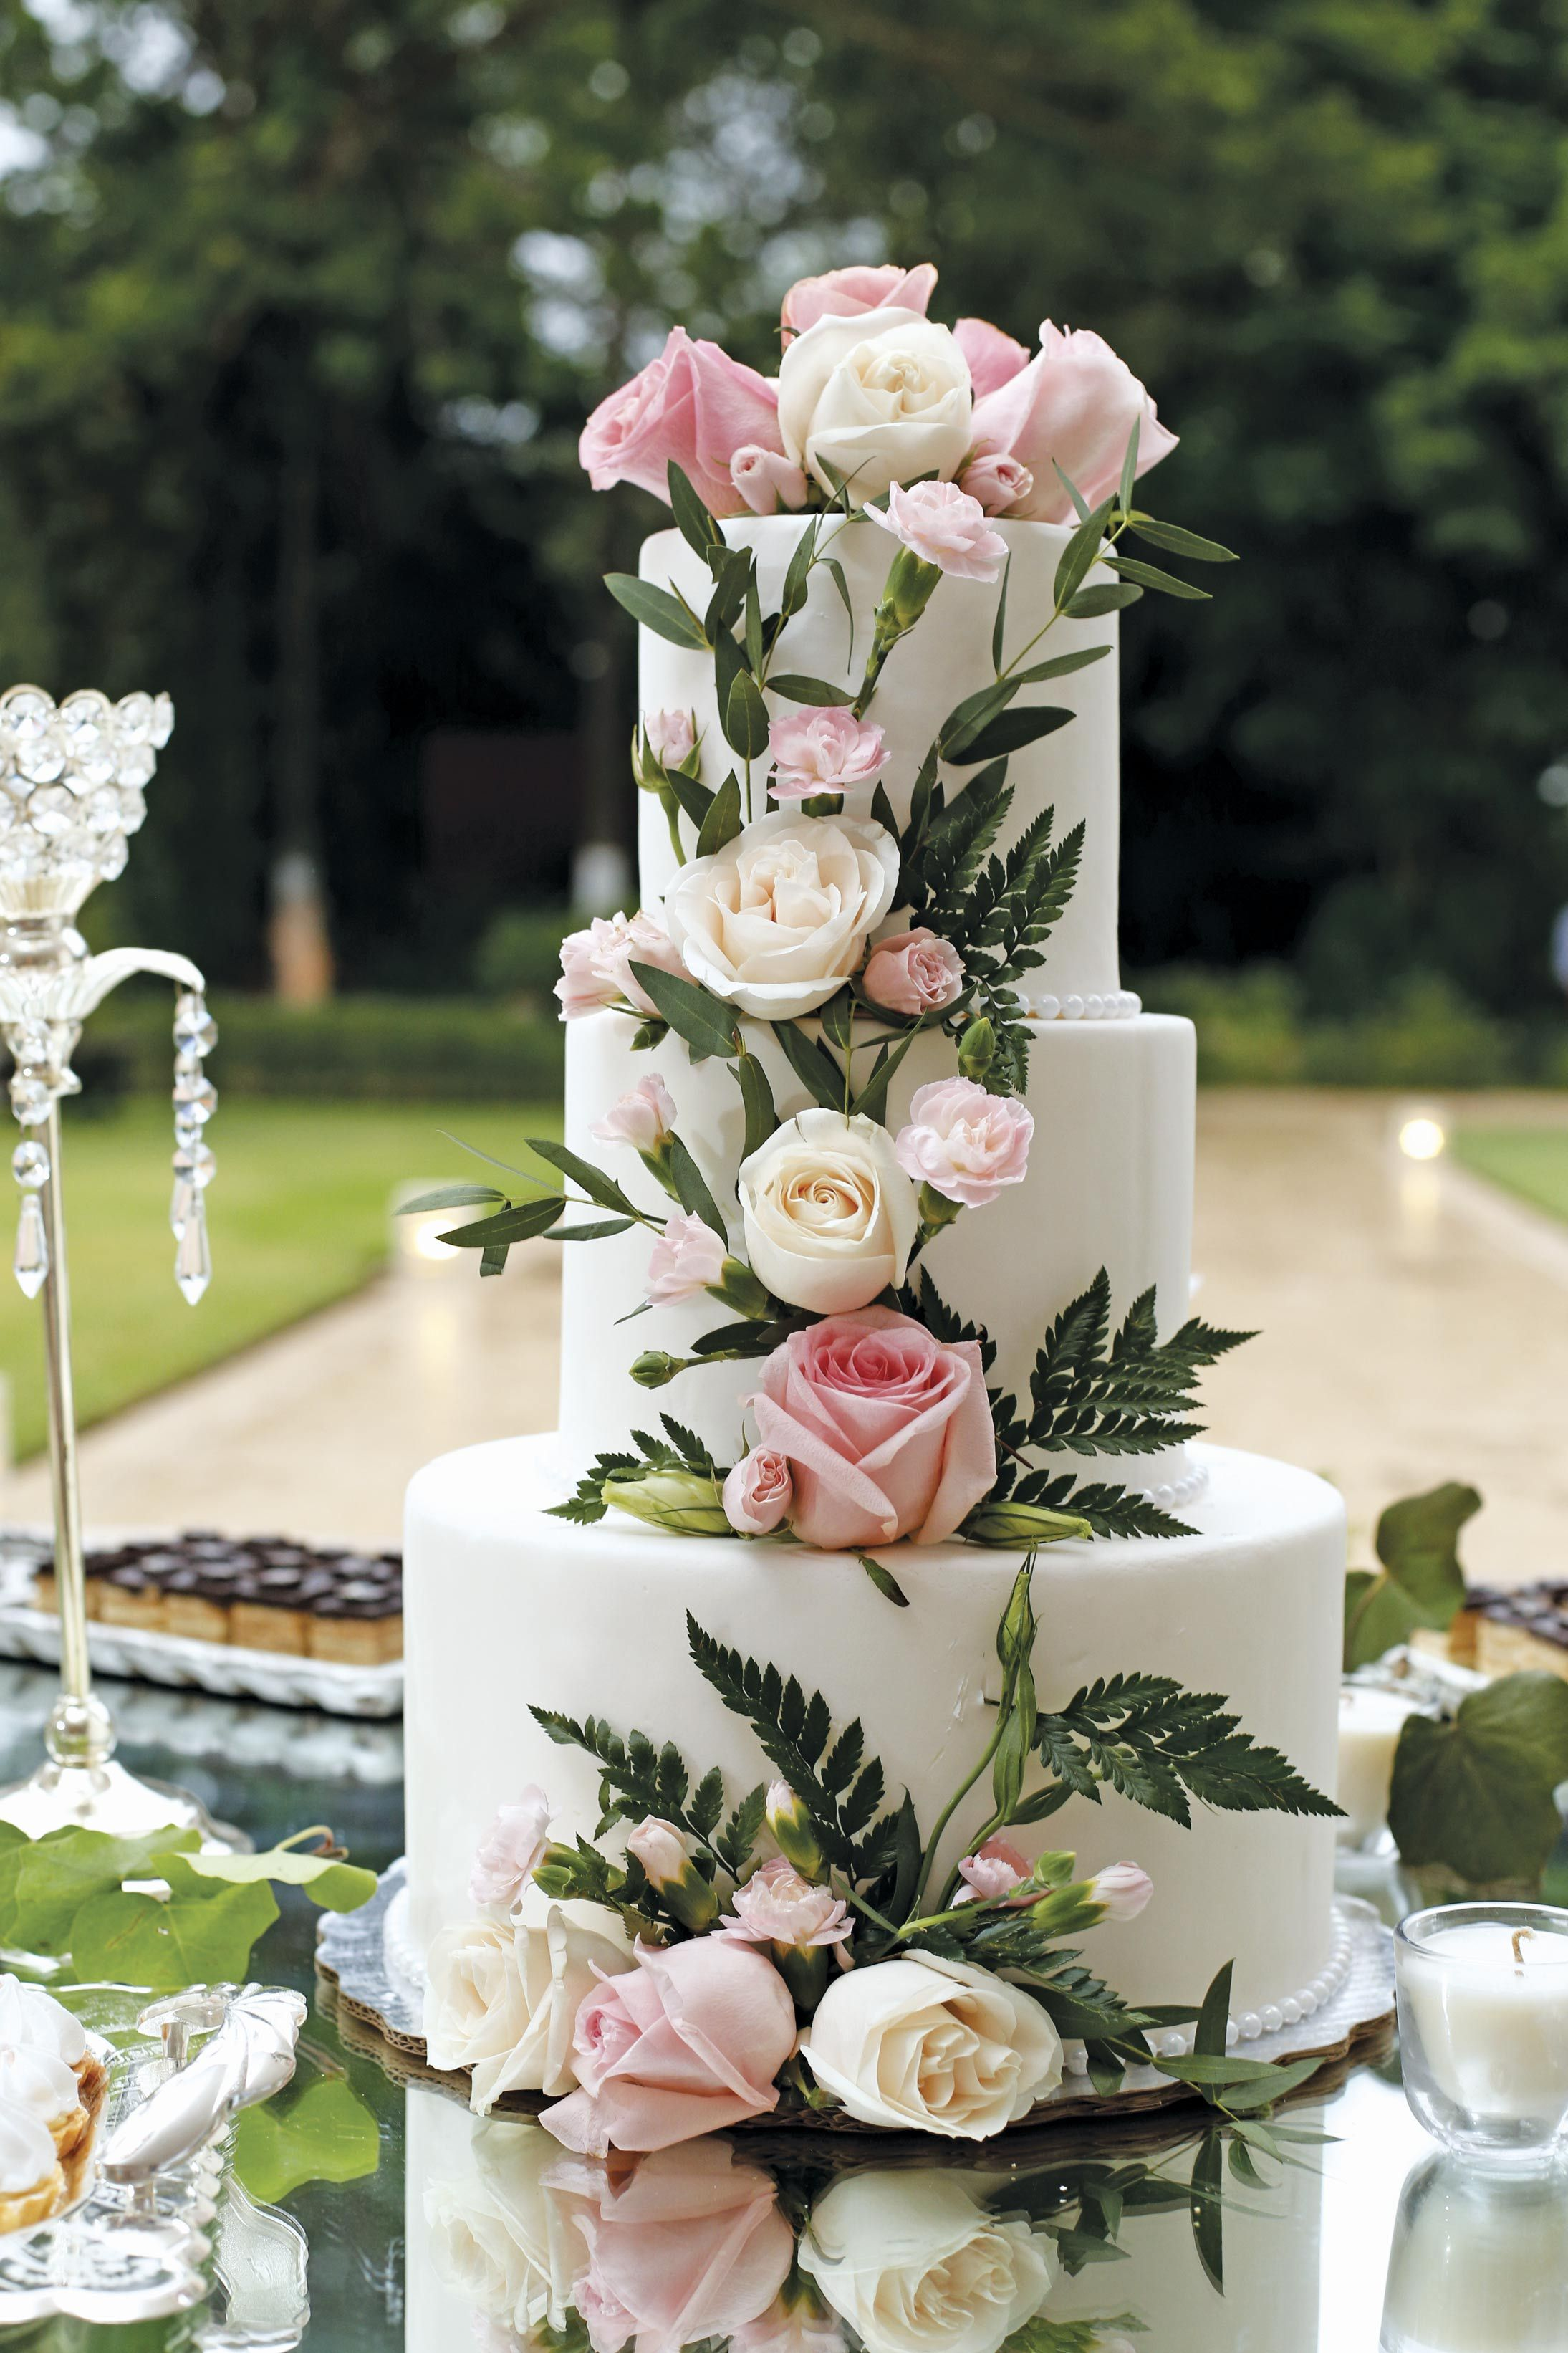 Decora Tu Pastel Con Flores Naturales Pasteldebodas Wedding